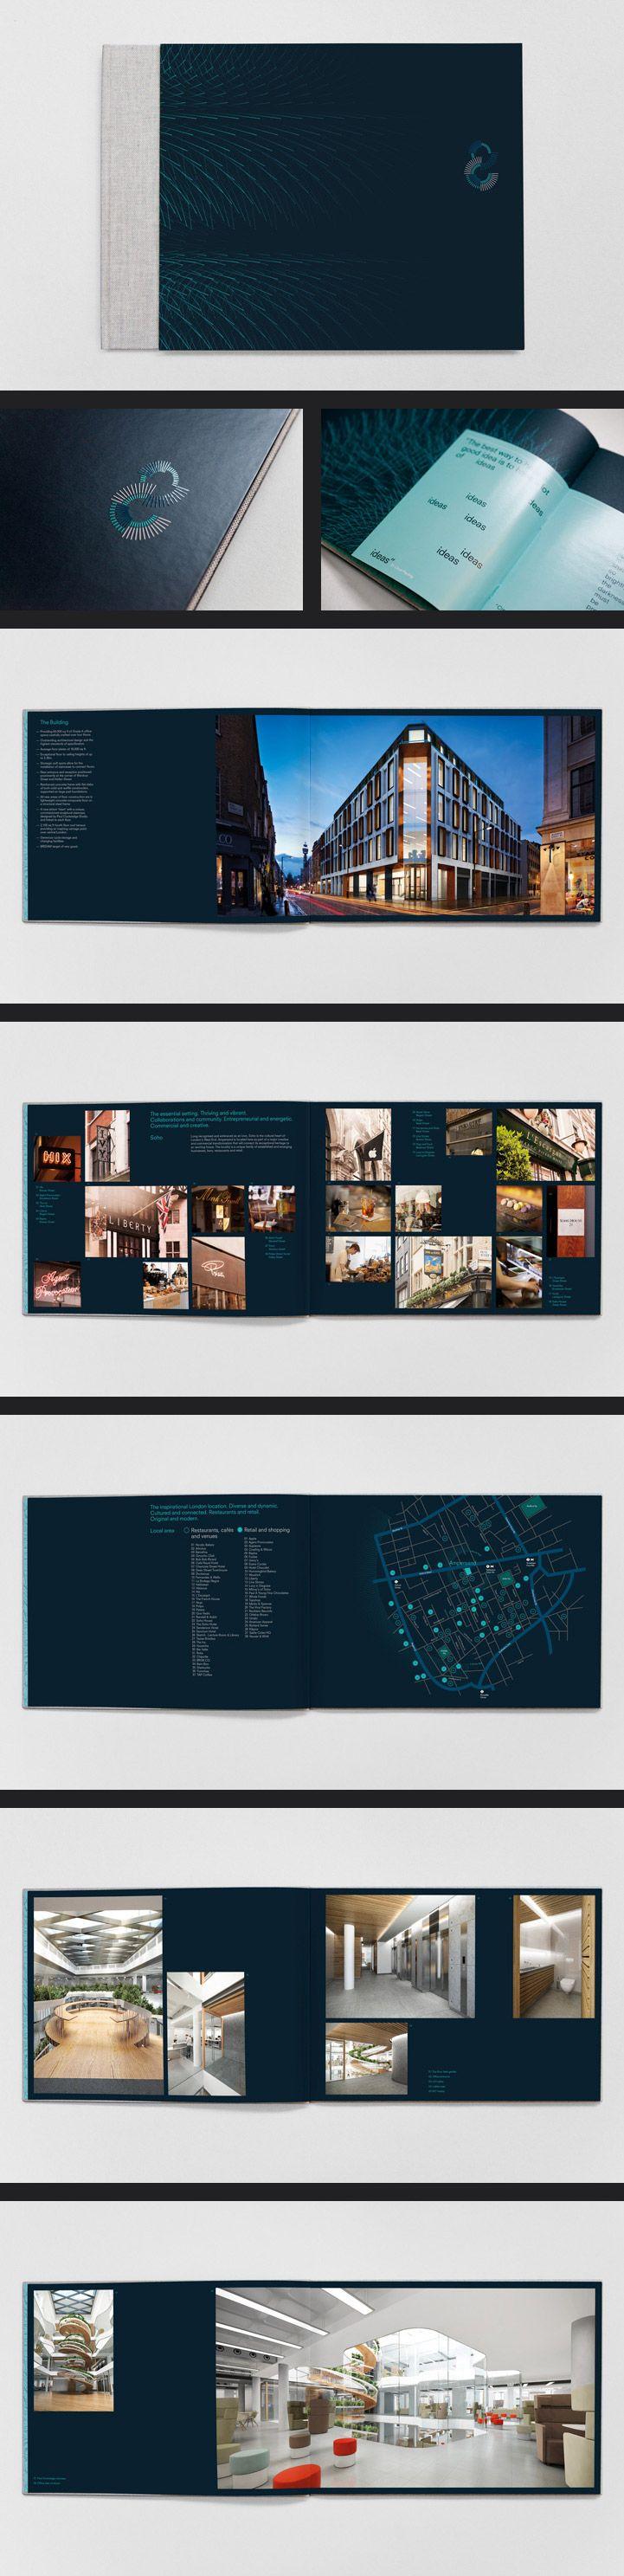 Ampersand Building | Tom Hingston Studio